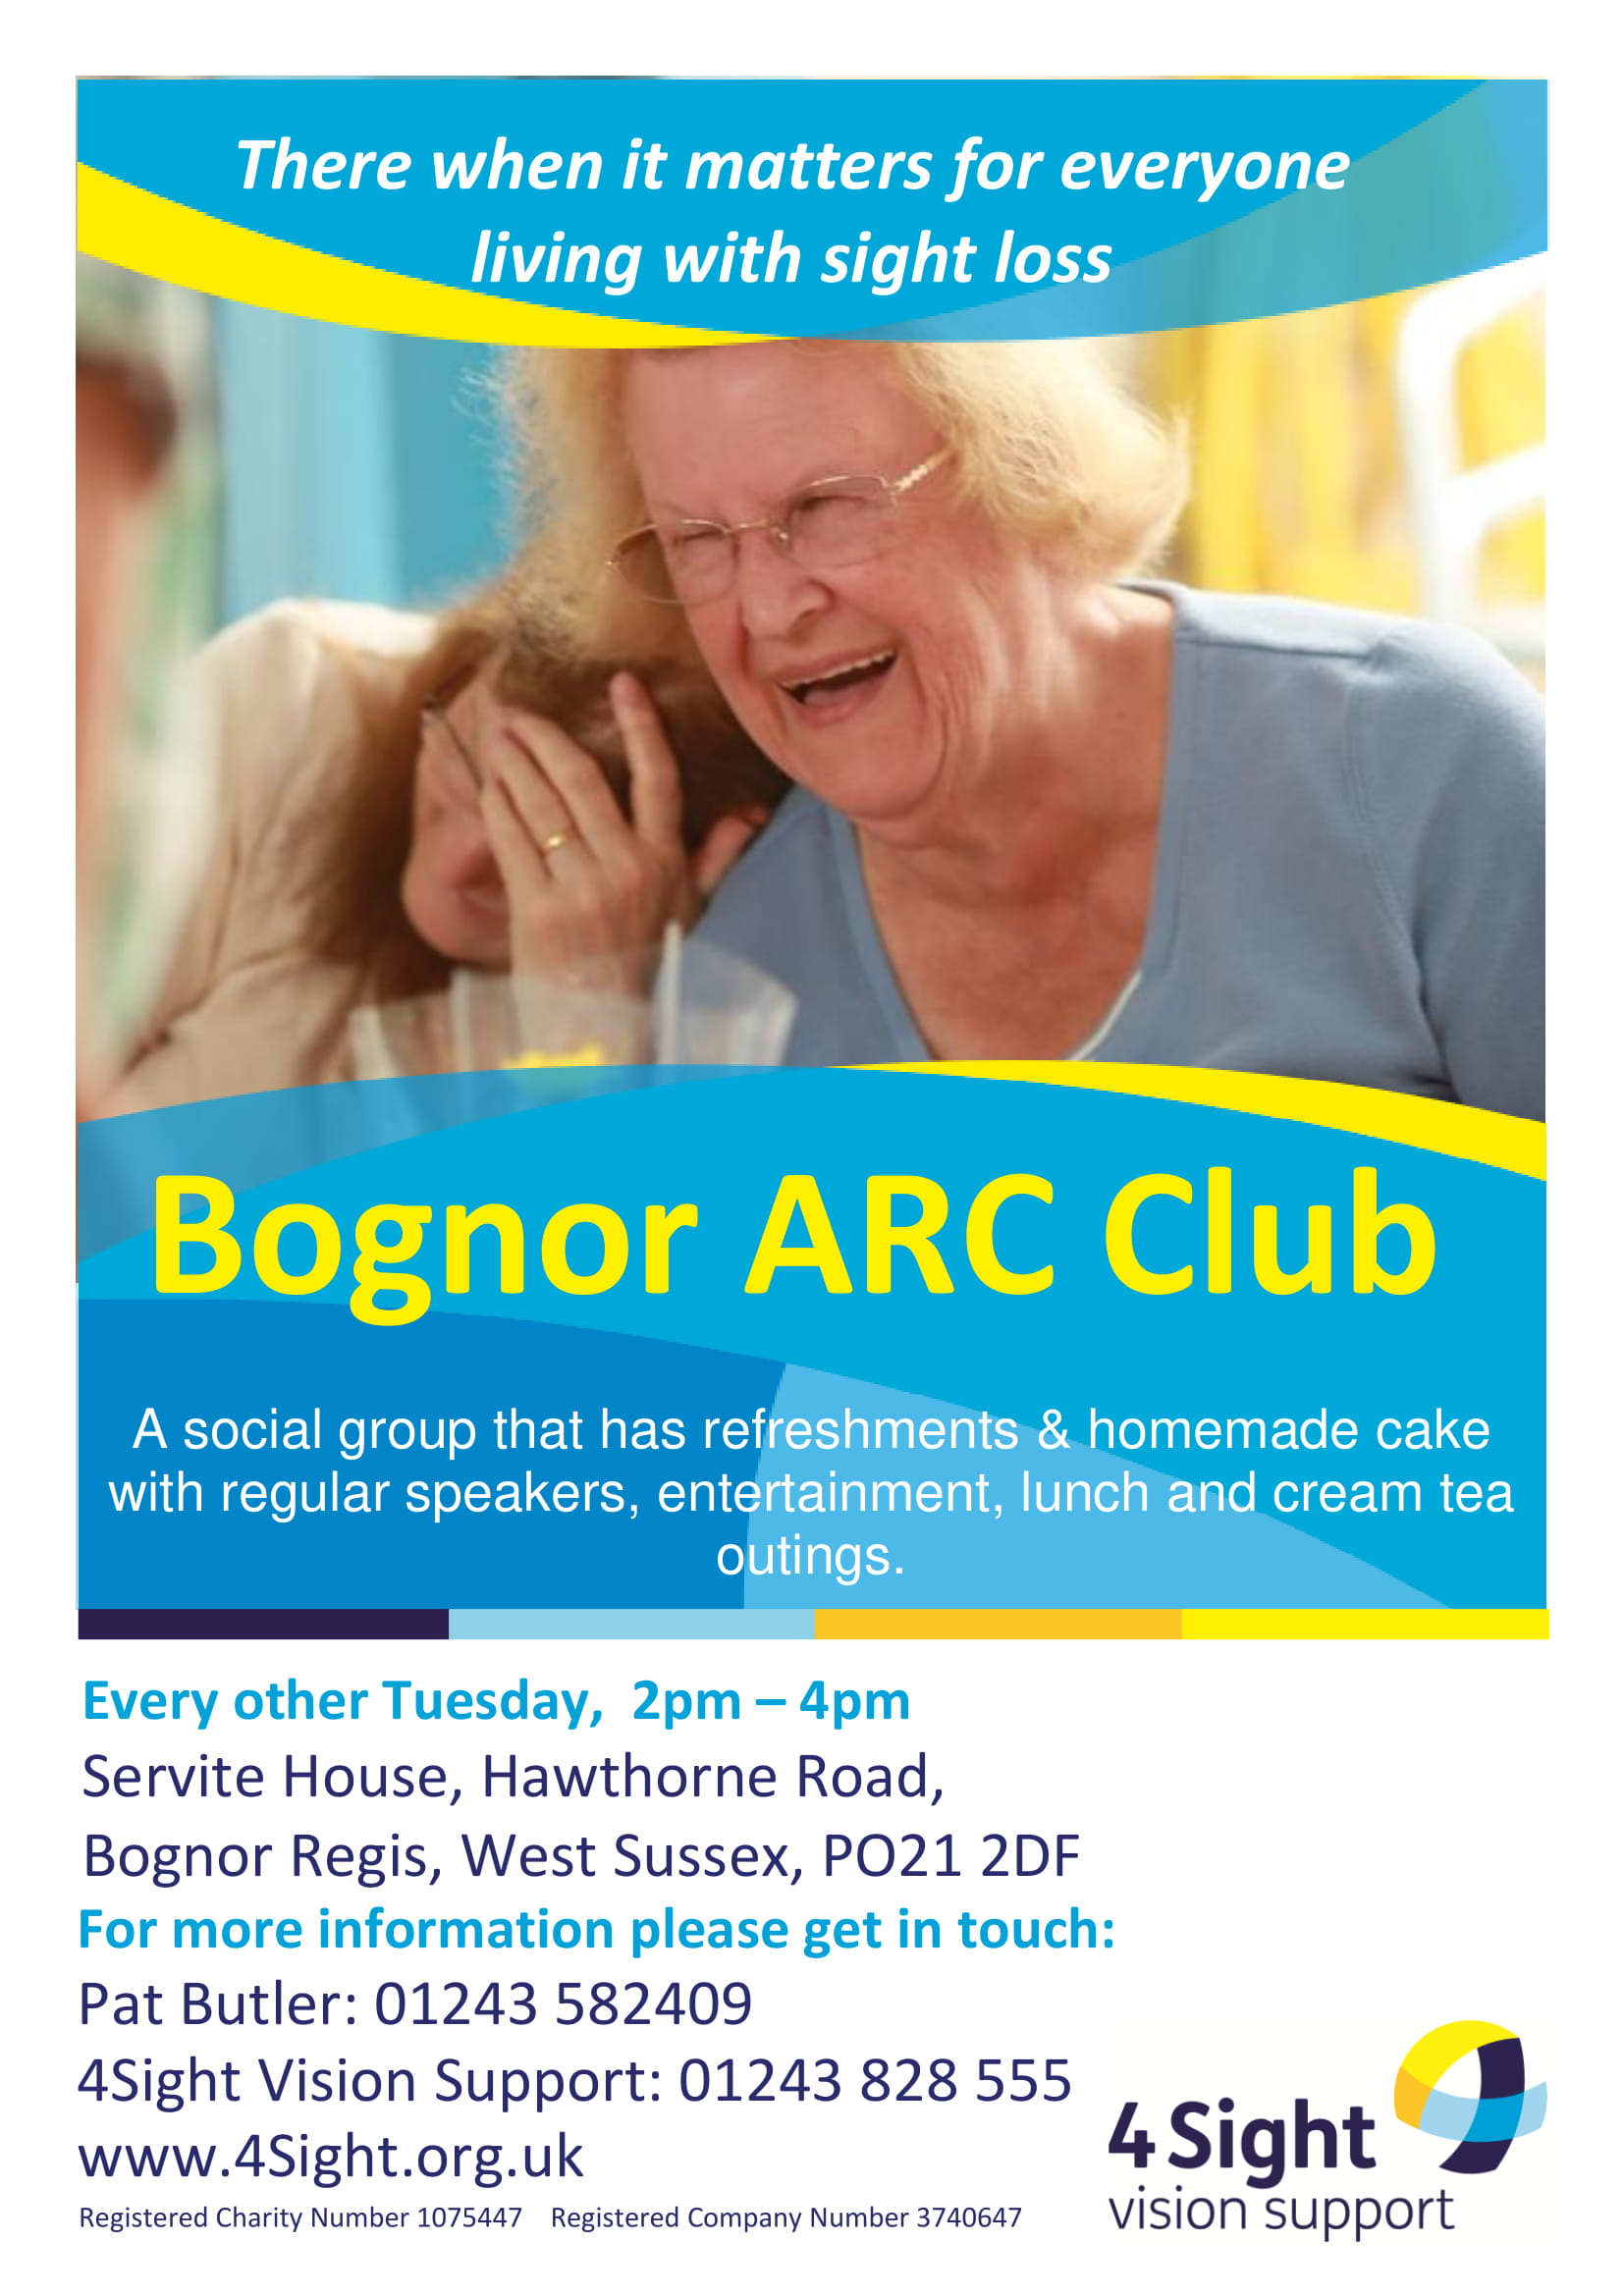 Bognor ARC Club-1